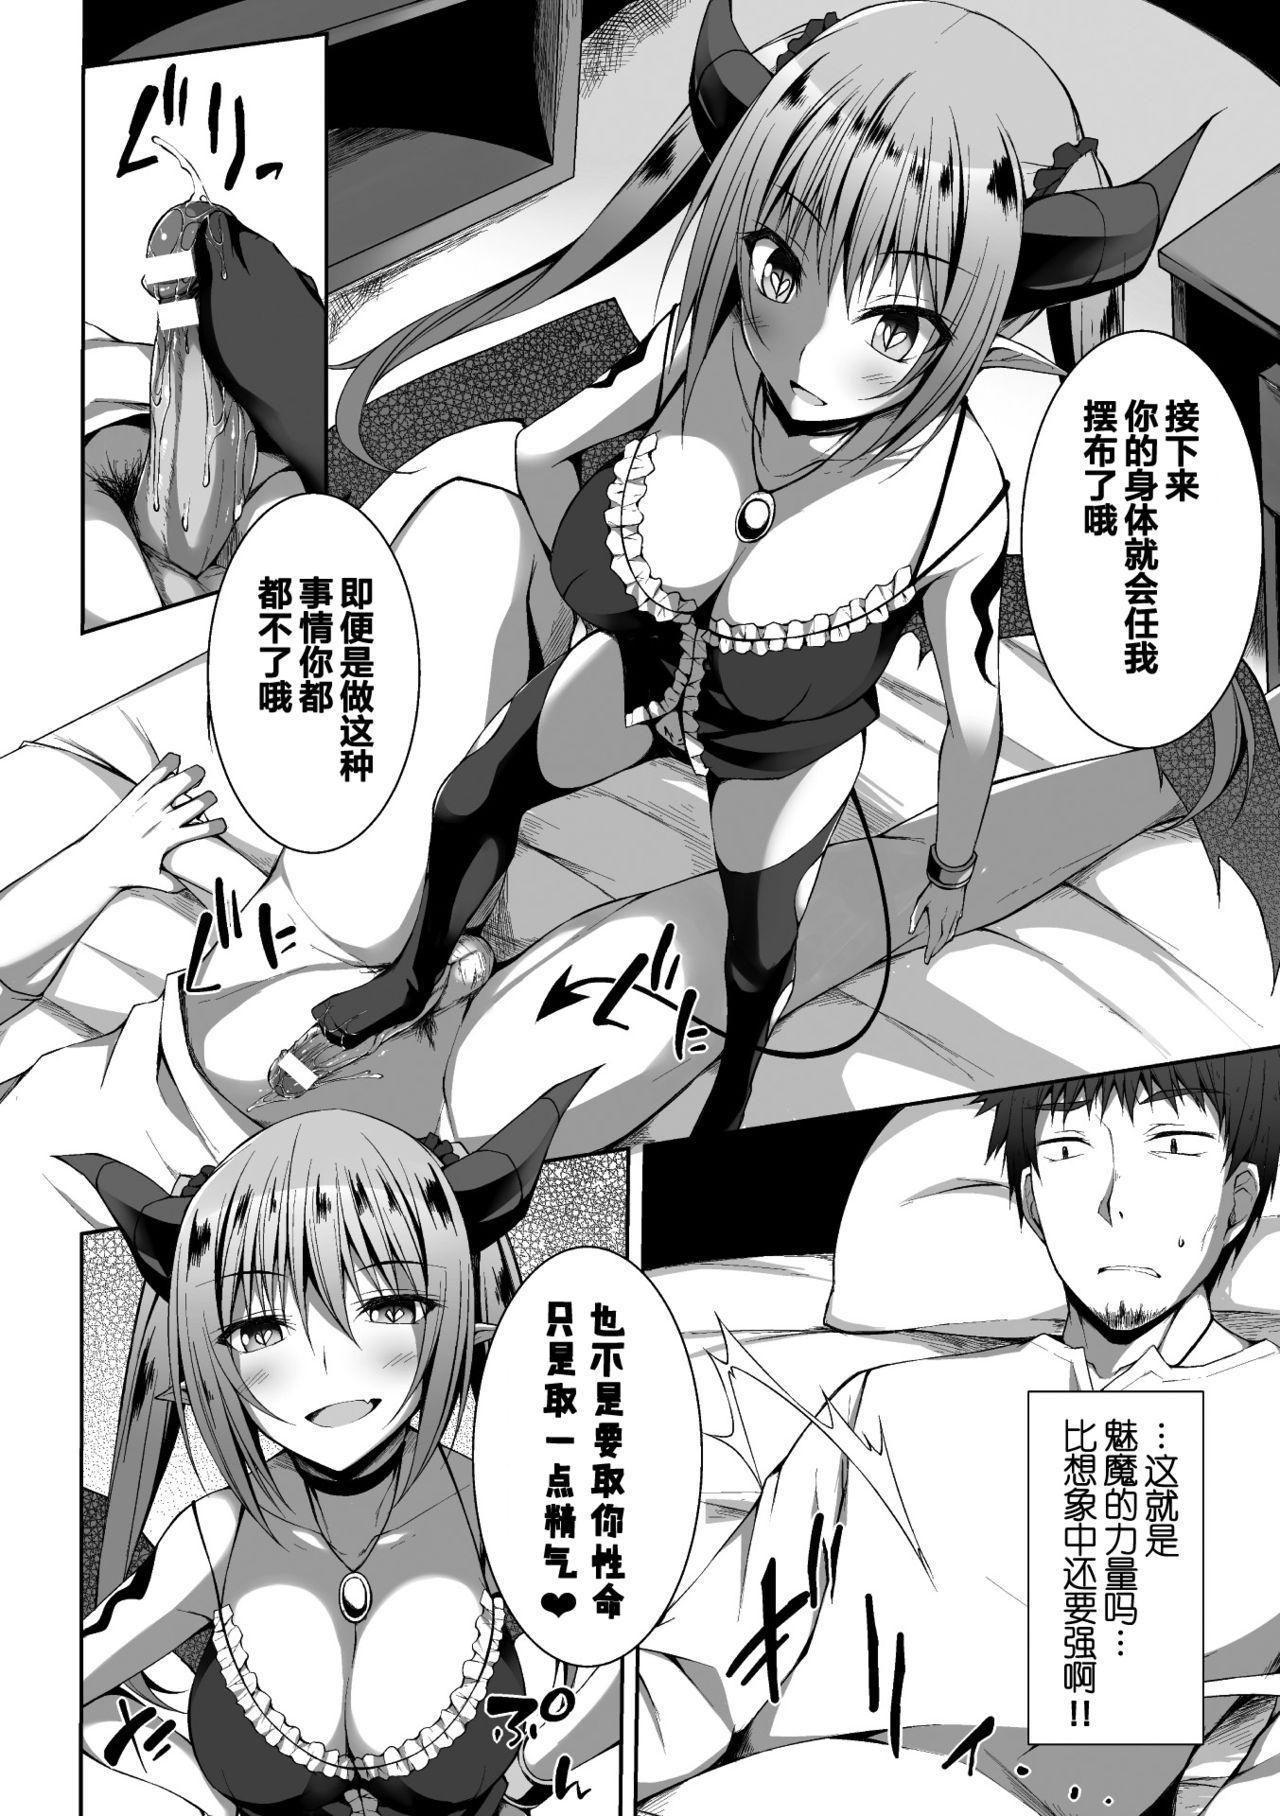 2D Comic Magazine Tenshi ni Ochiru Akuma-tachi Vol. 1 5